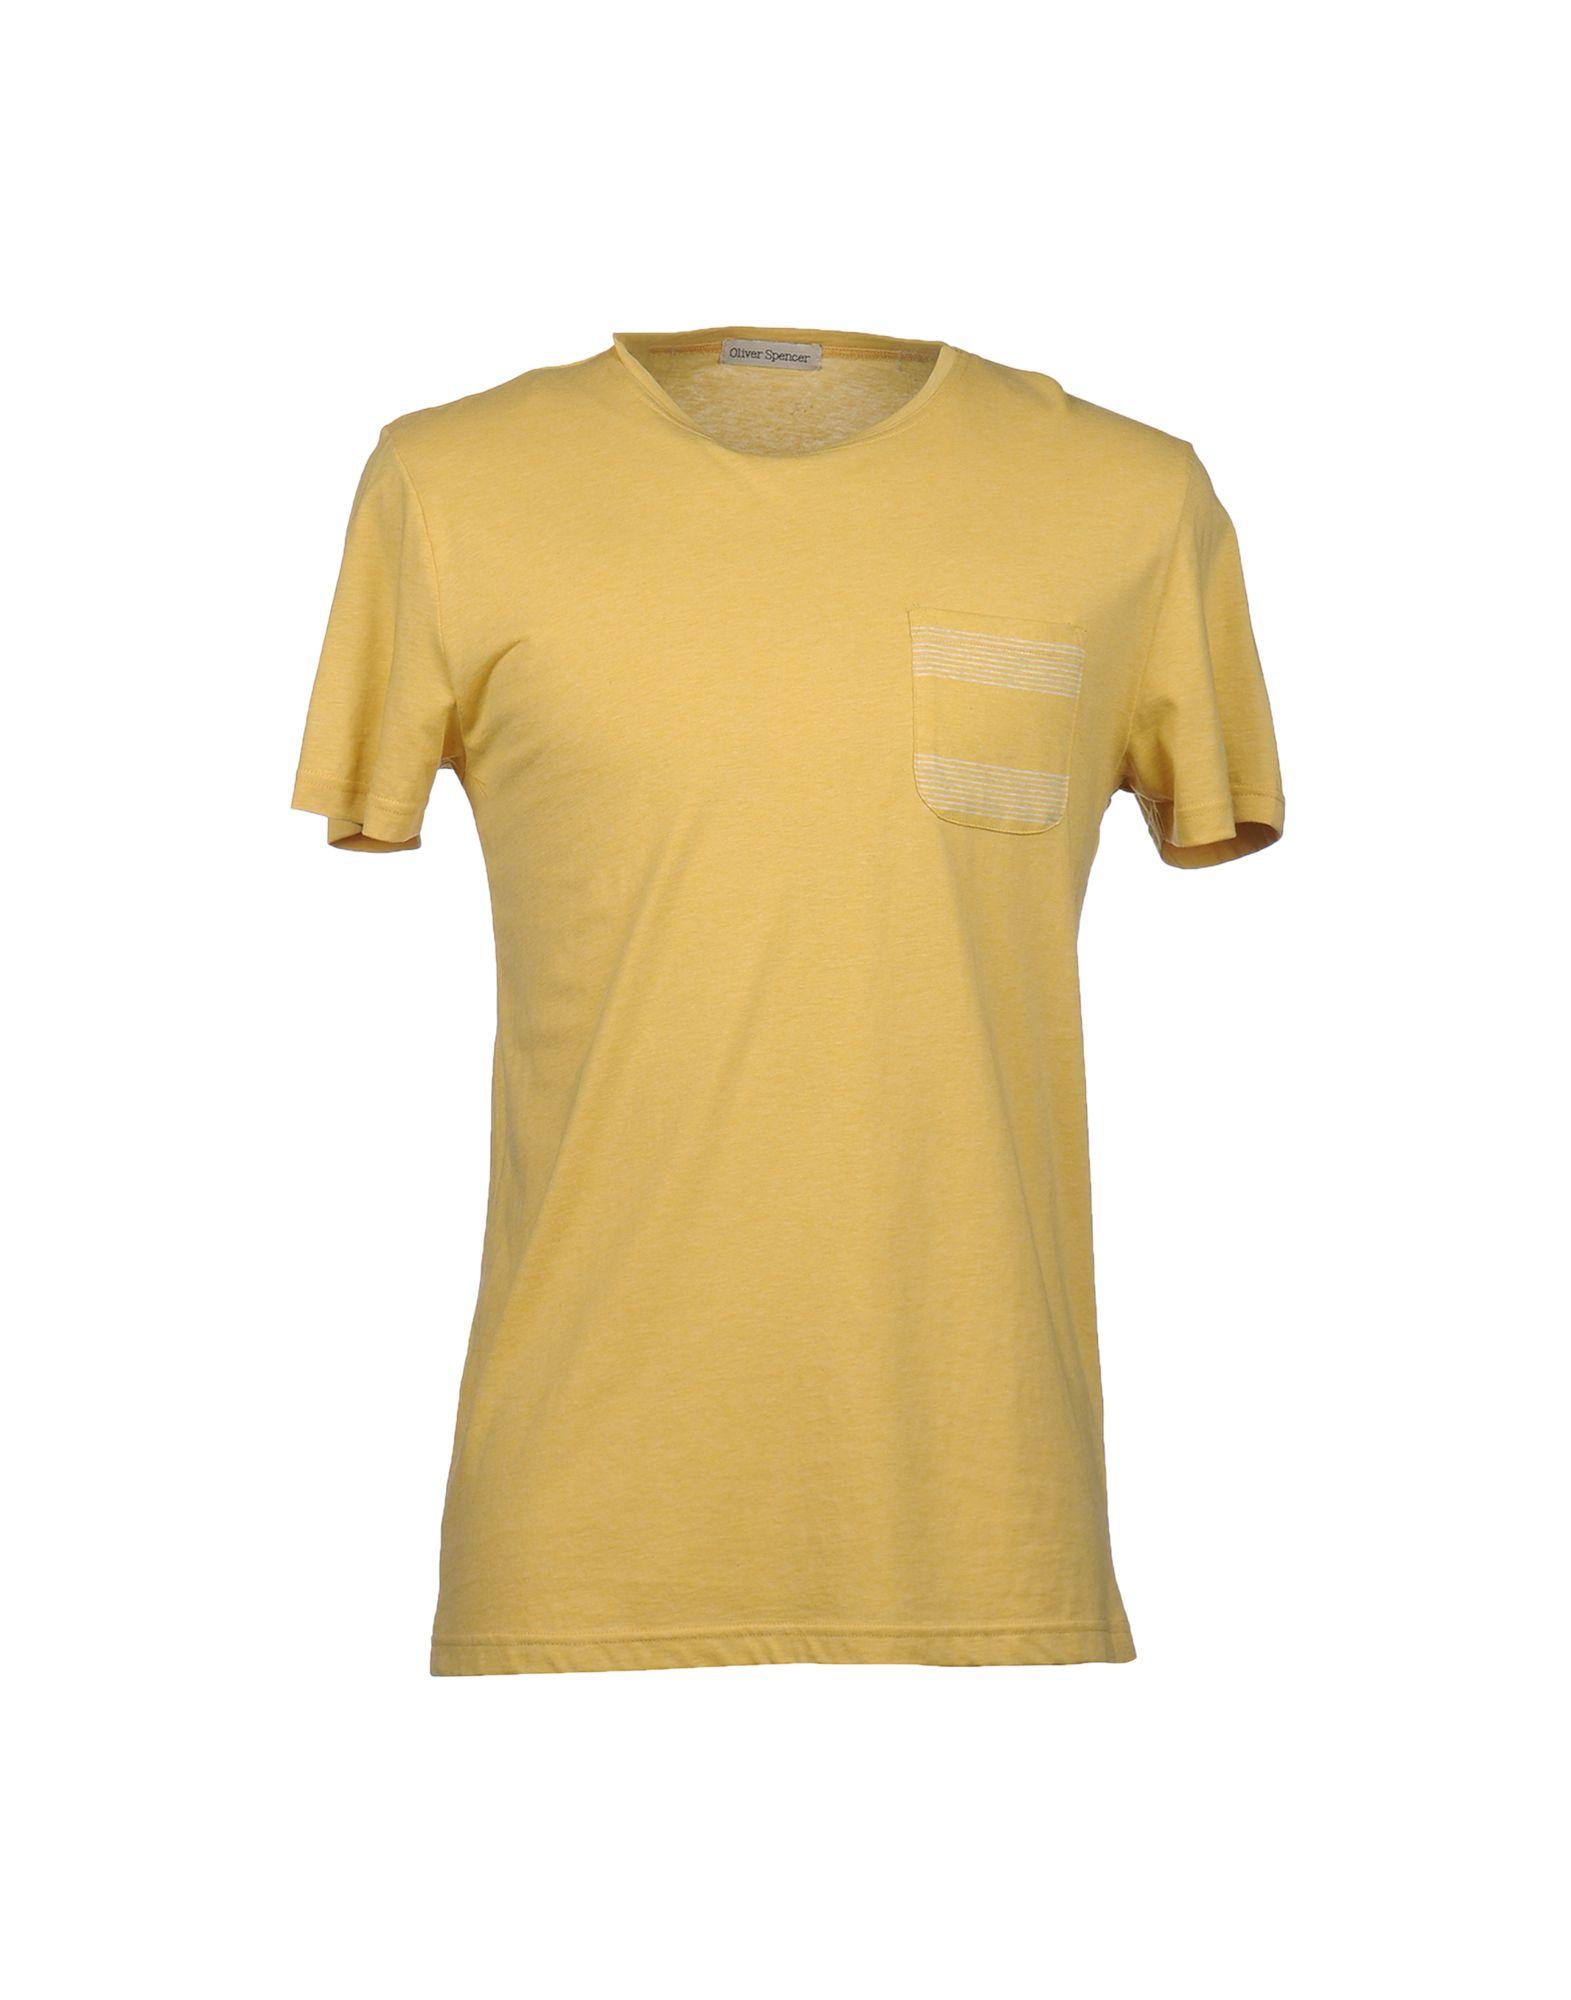 oliver spencer short sleeve t shirt in yellow for men lyst. Black Bedroom Furniture Sets. Home Design Ideas